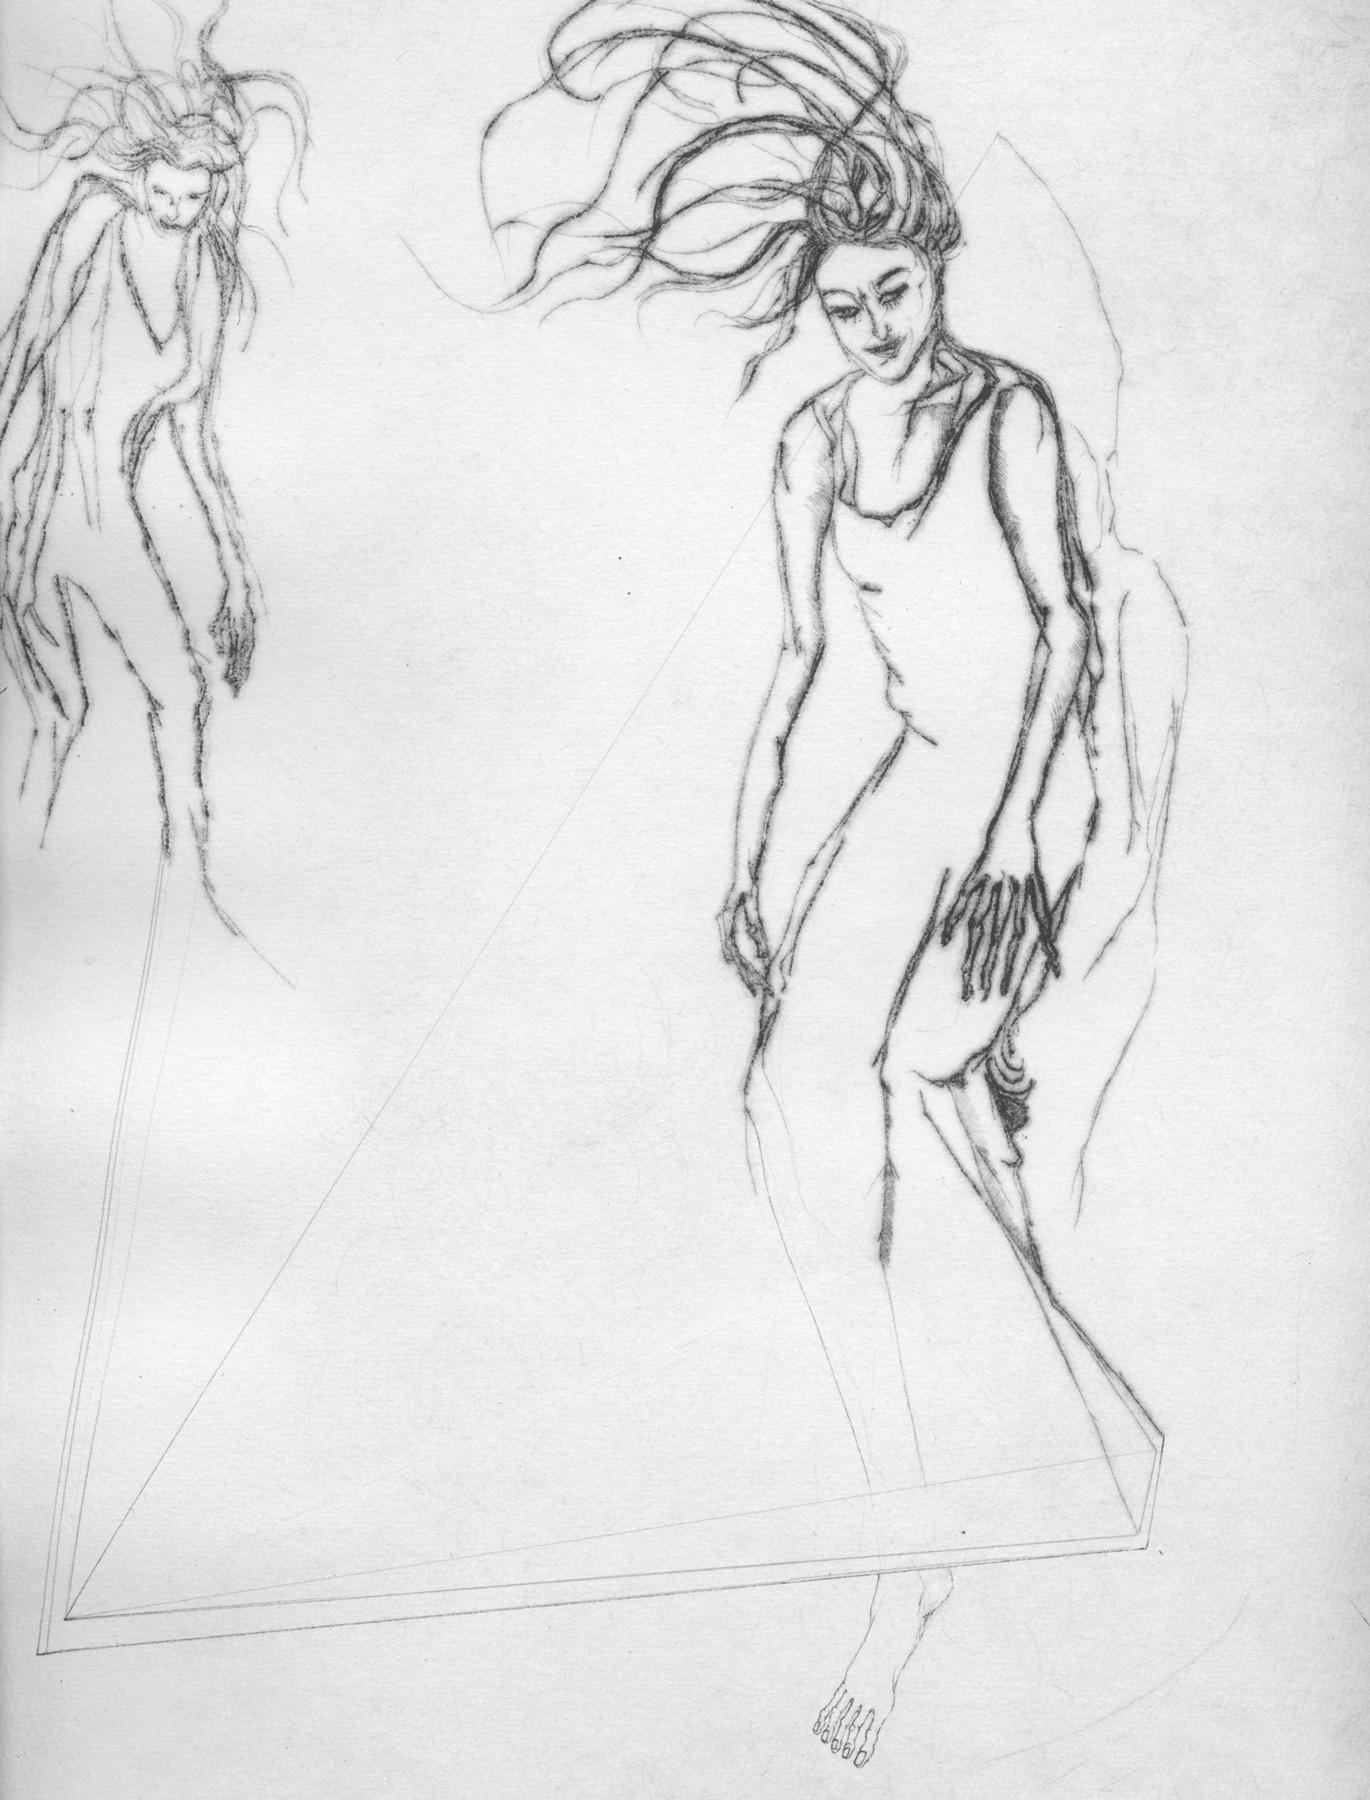 Nina Annabelle Märkl   Moshpit 4 11   Kaltnadel, Tusche, Bleistift, 300g Hahnemühle Büttenpapier   Platte 29,7 x 27 cm Papier 56 x 39 cm